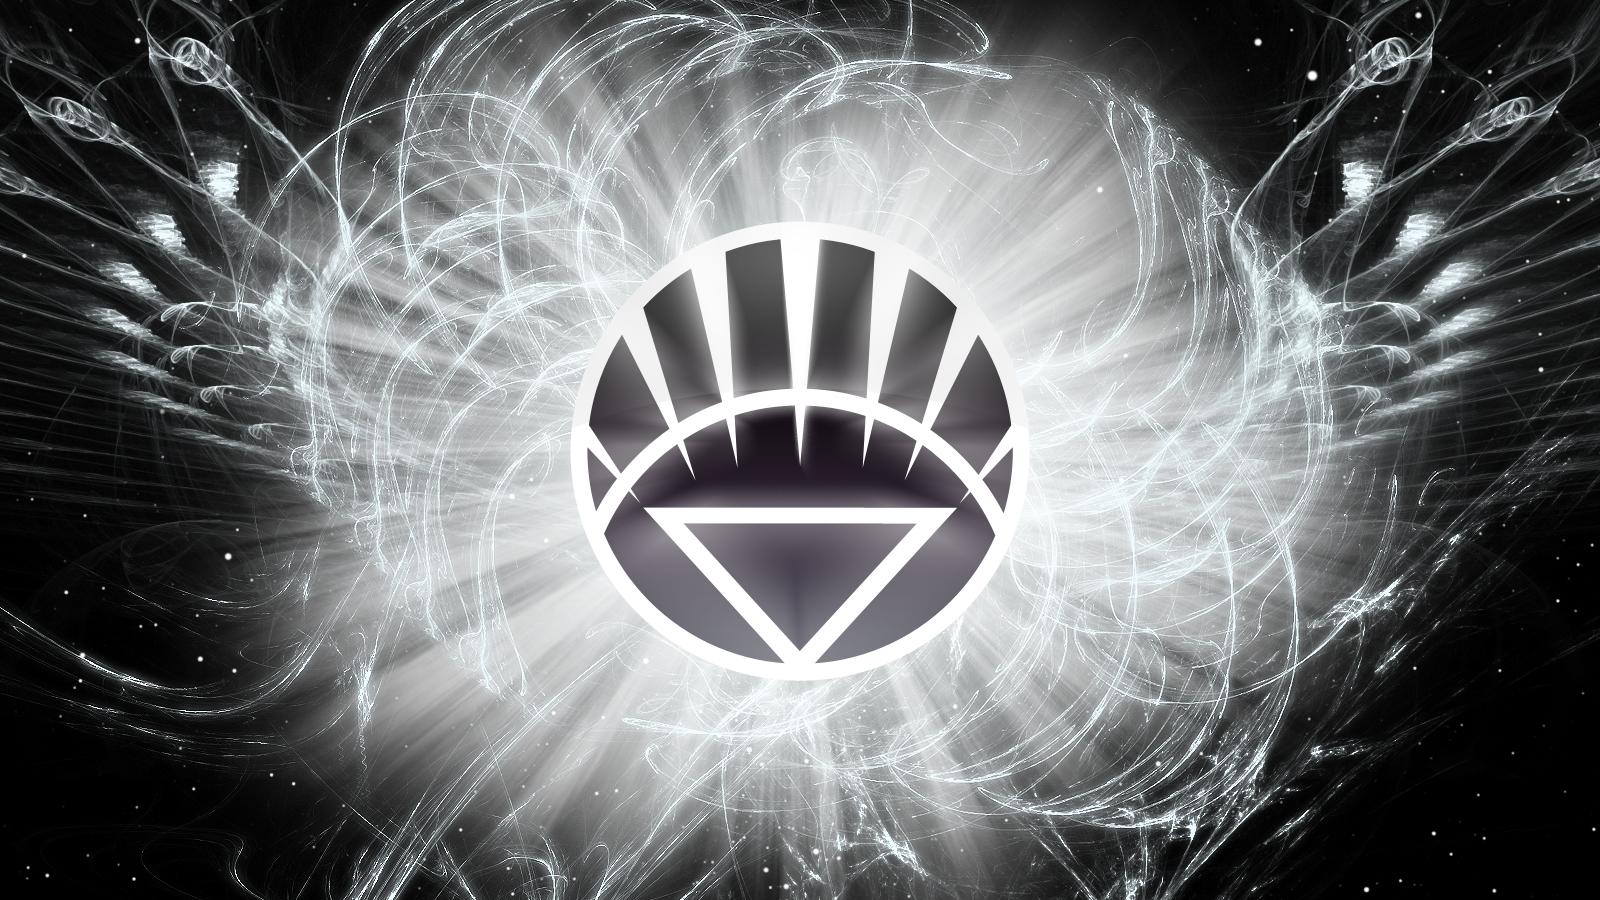 lantern-corps-symbols